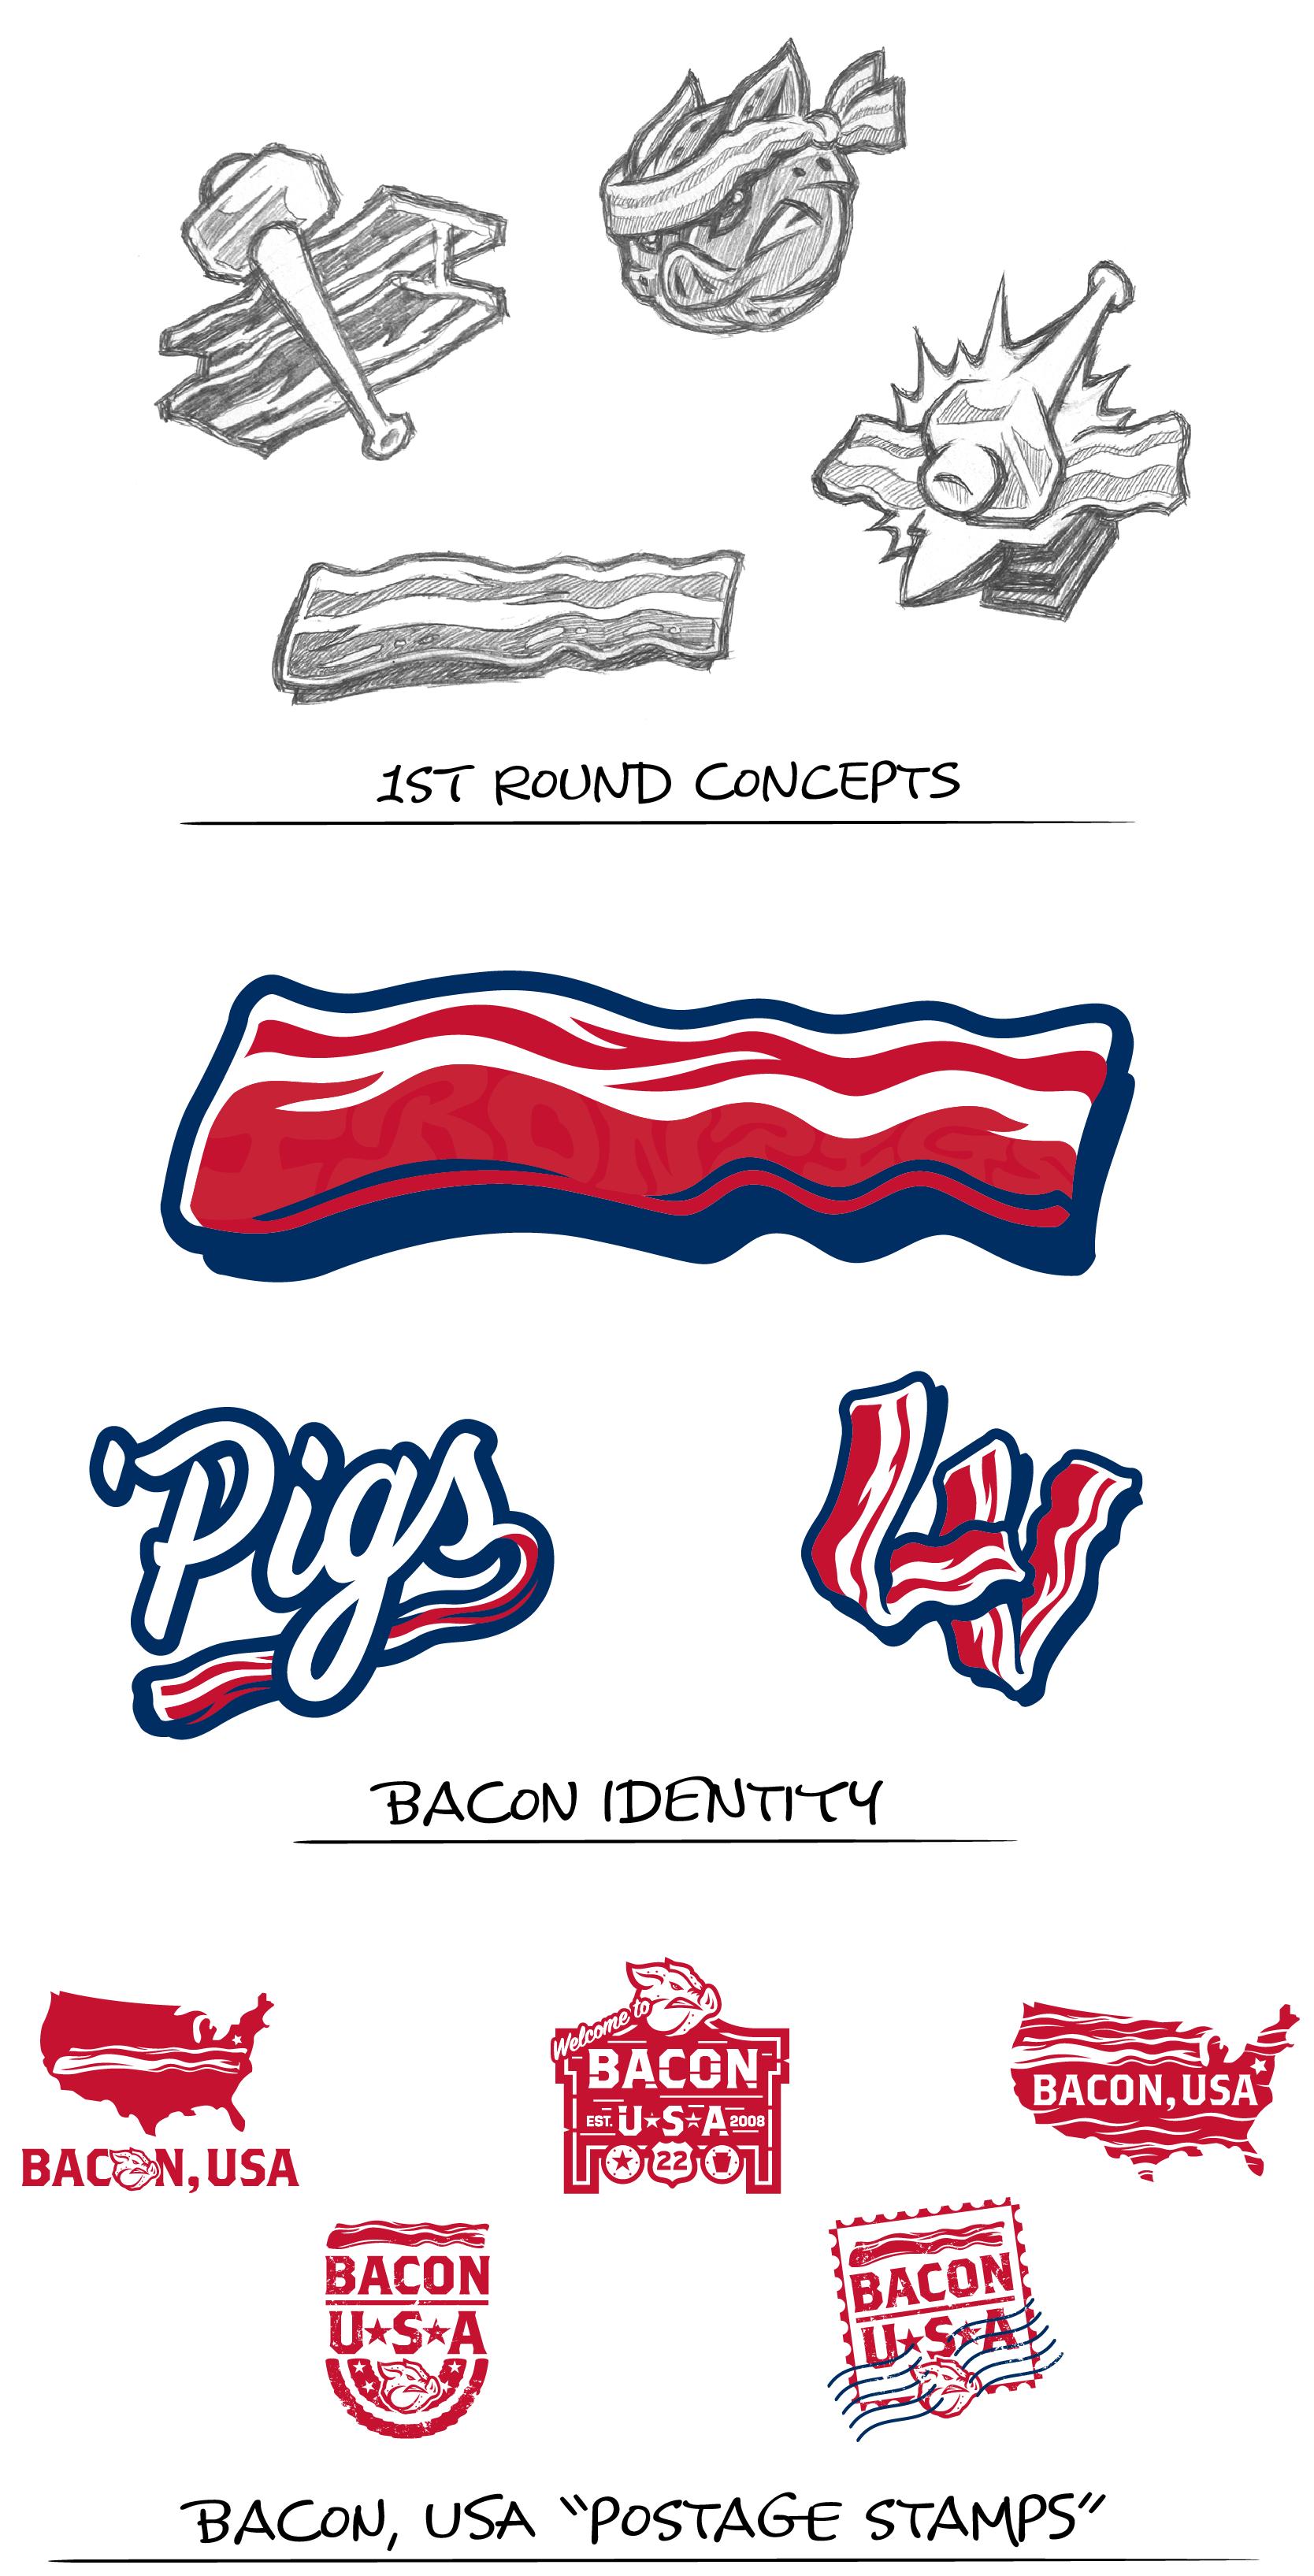 Lehigh-3-BallparkMagic_Bacon-2.png